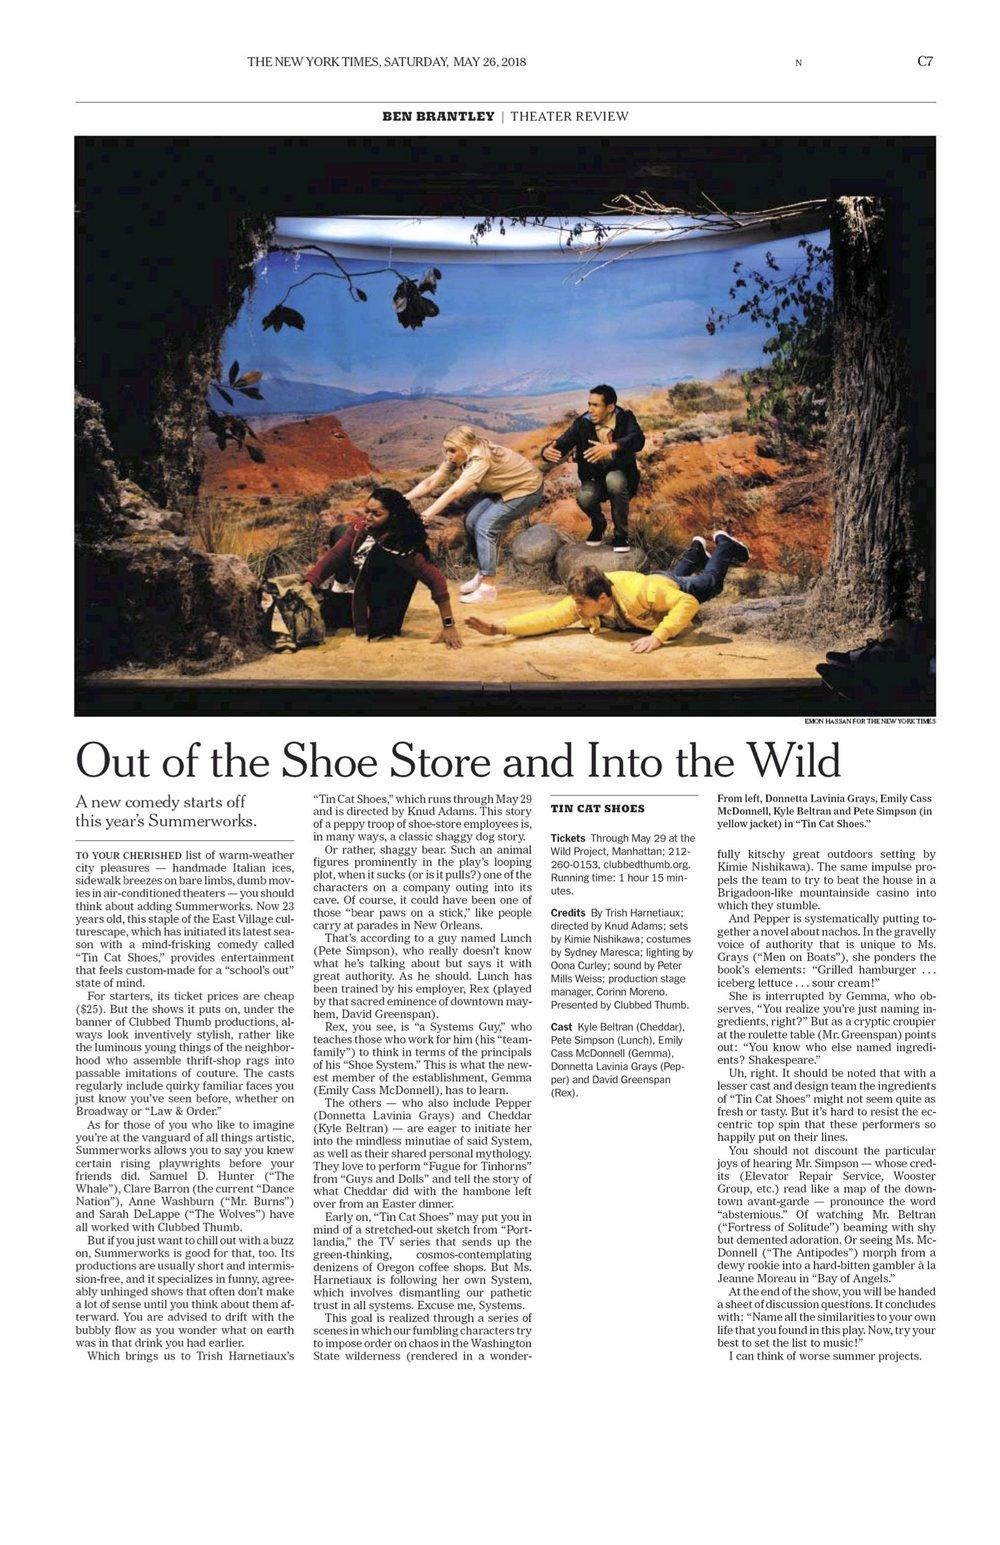 2018.05.26_NYT_C7_Tin_Cat_Shoes.jpg